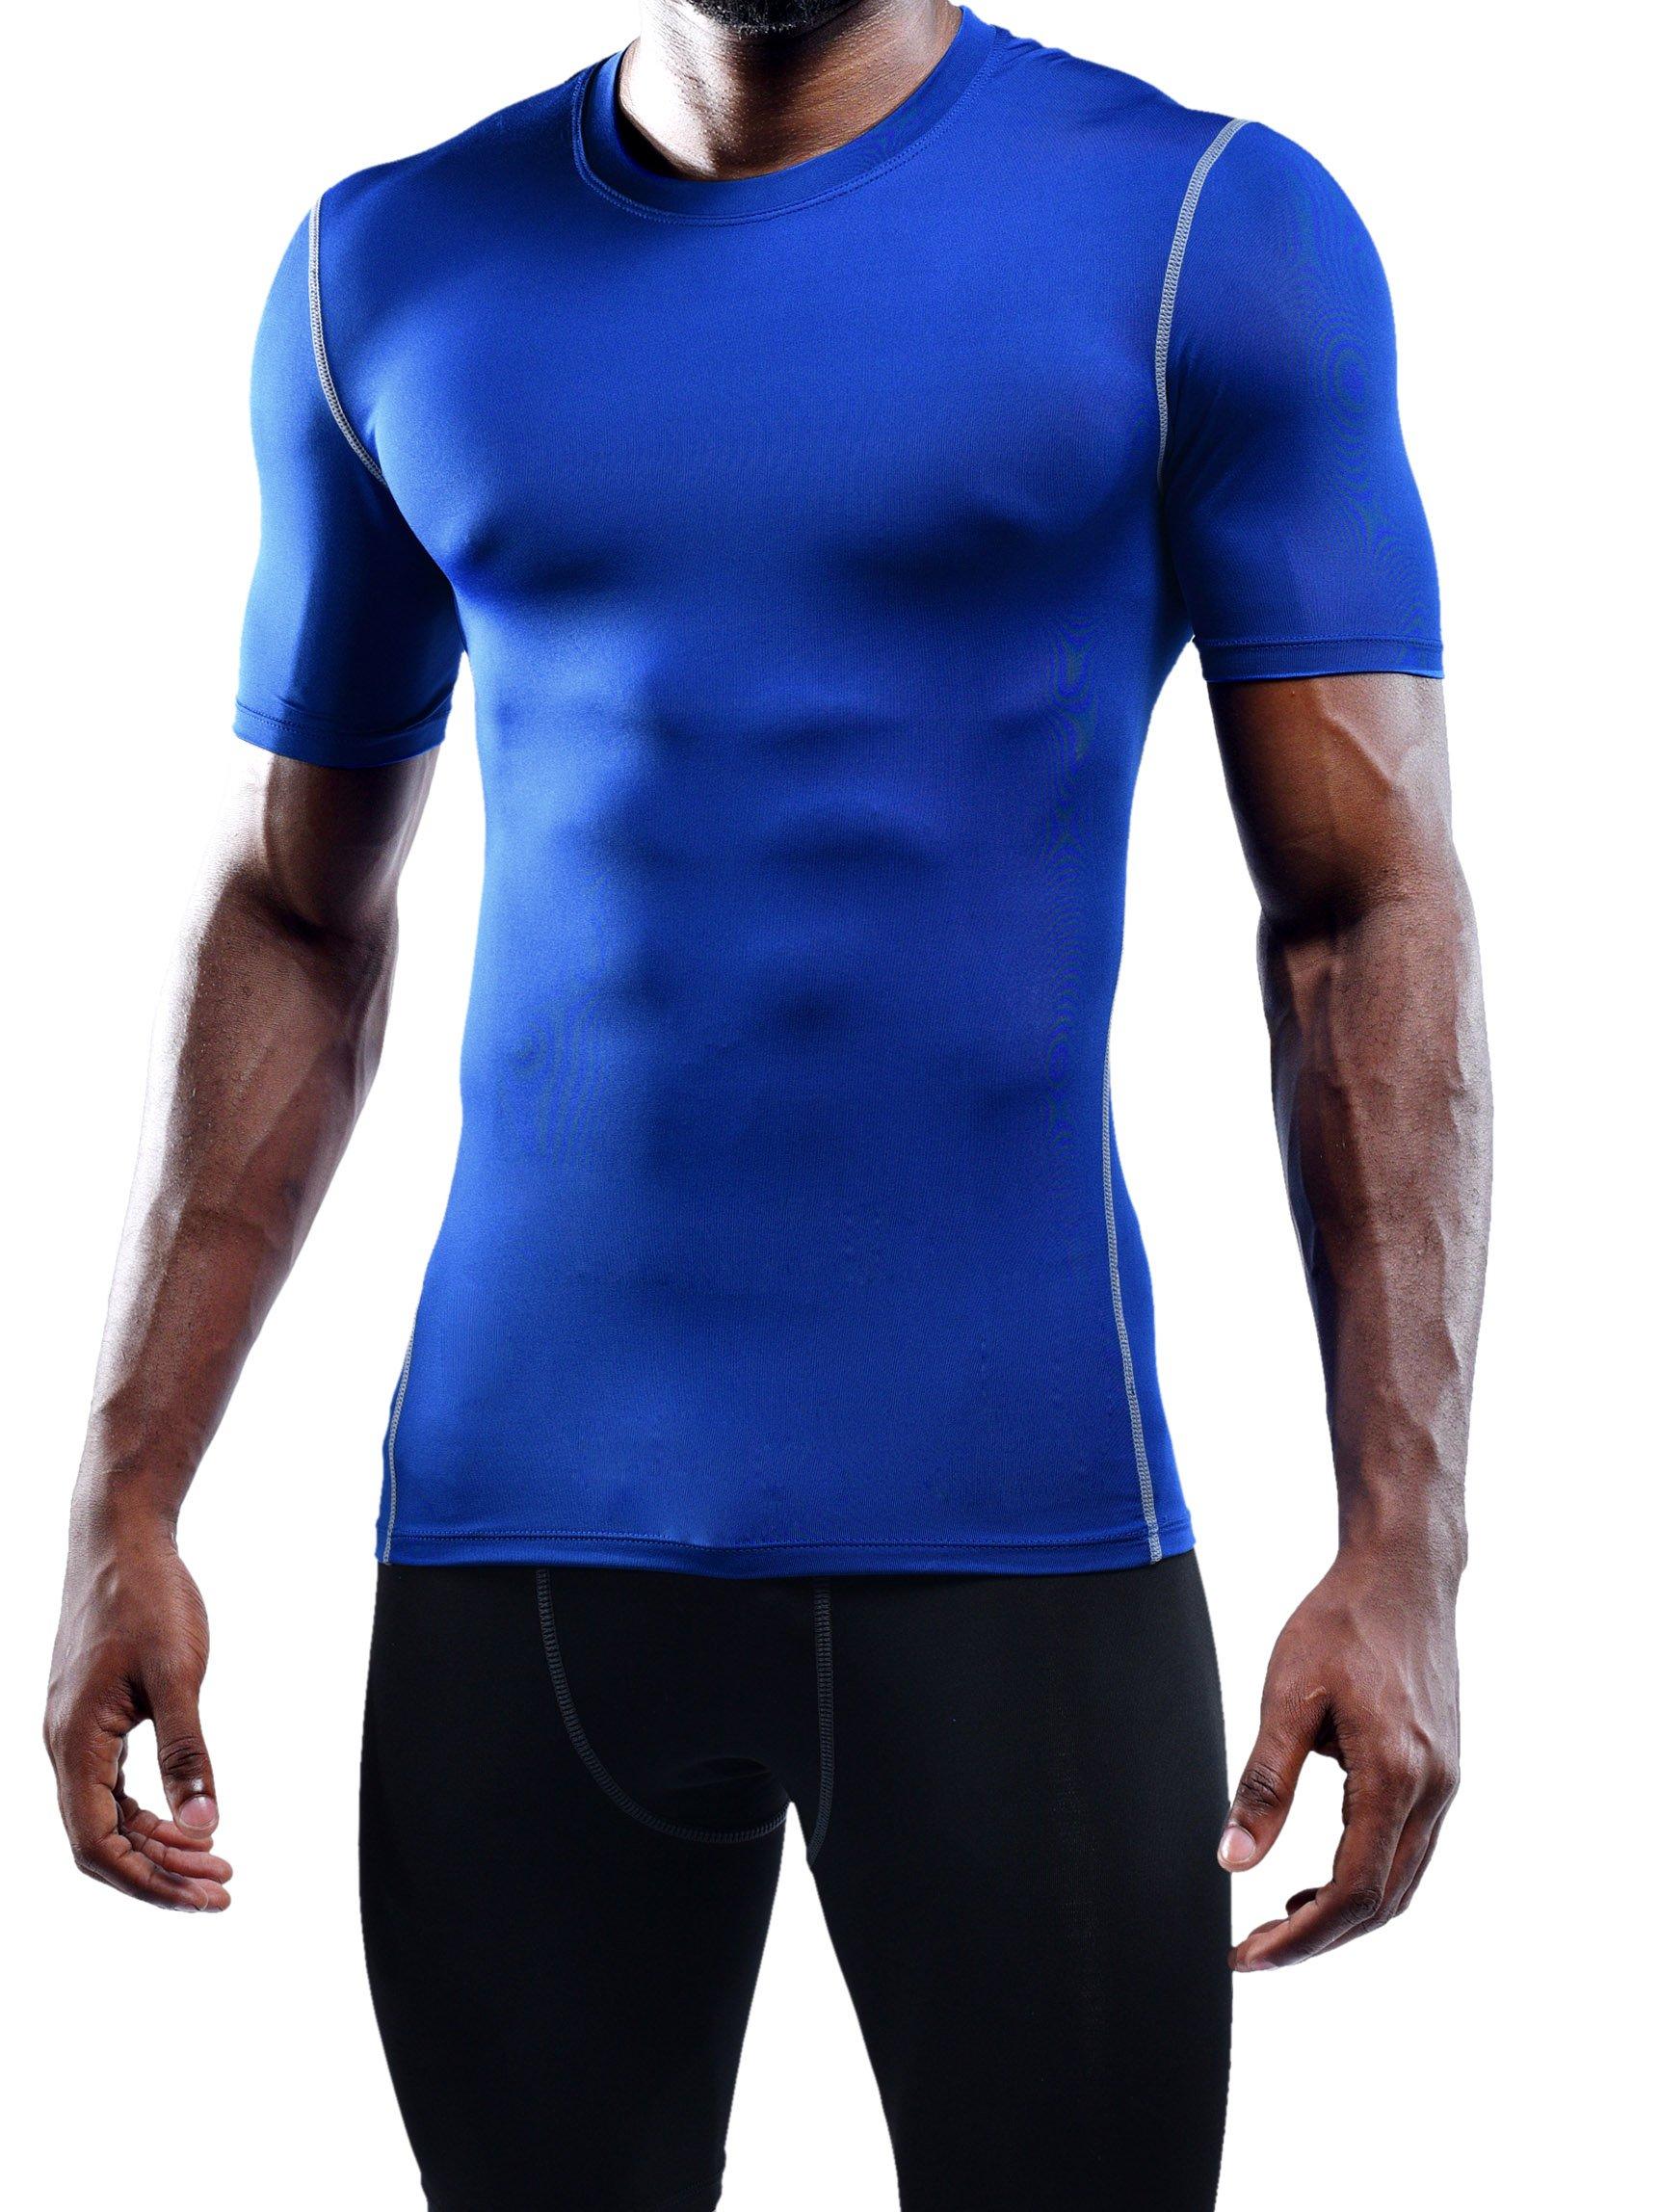 Neleus Men's Workout Athletic Compression Shirts Pack of 3